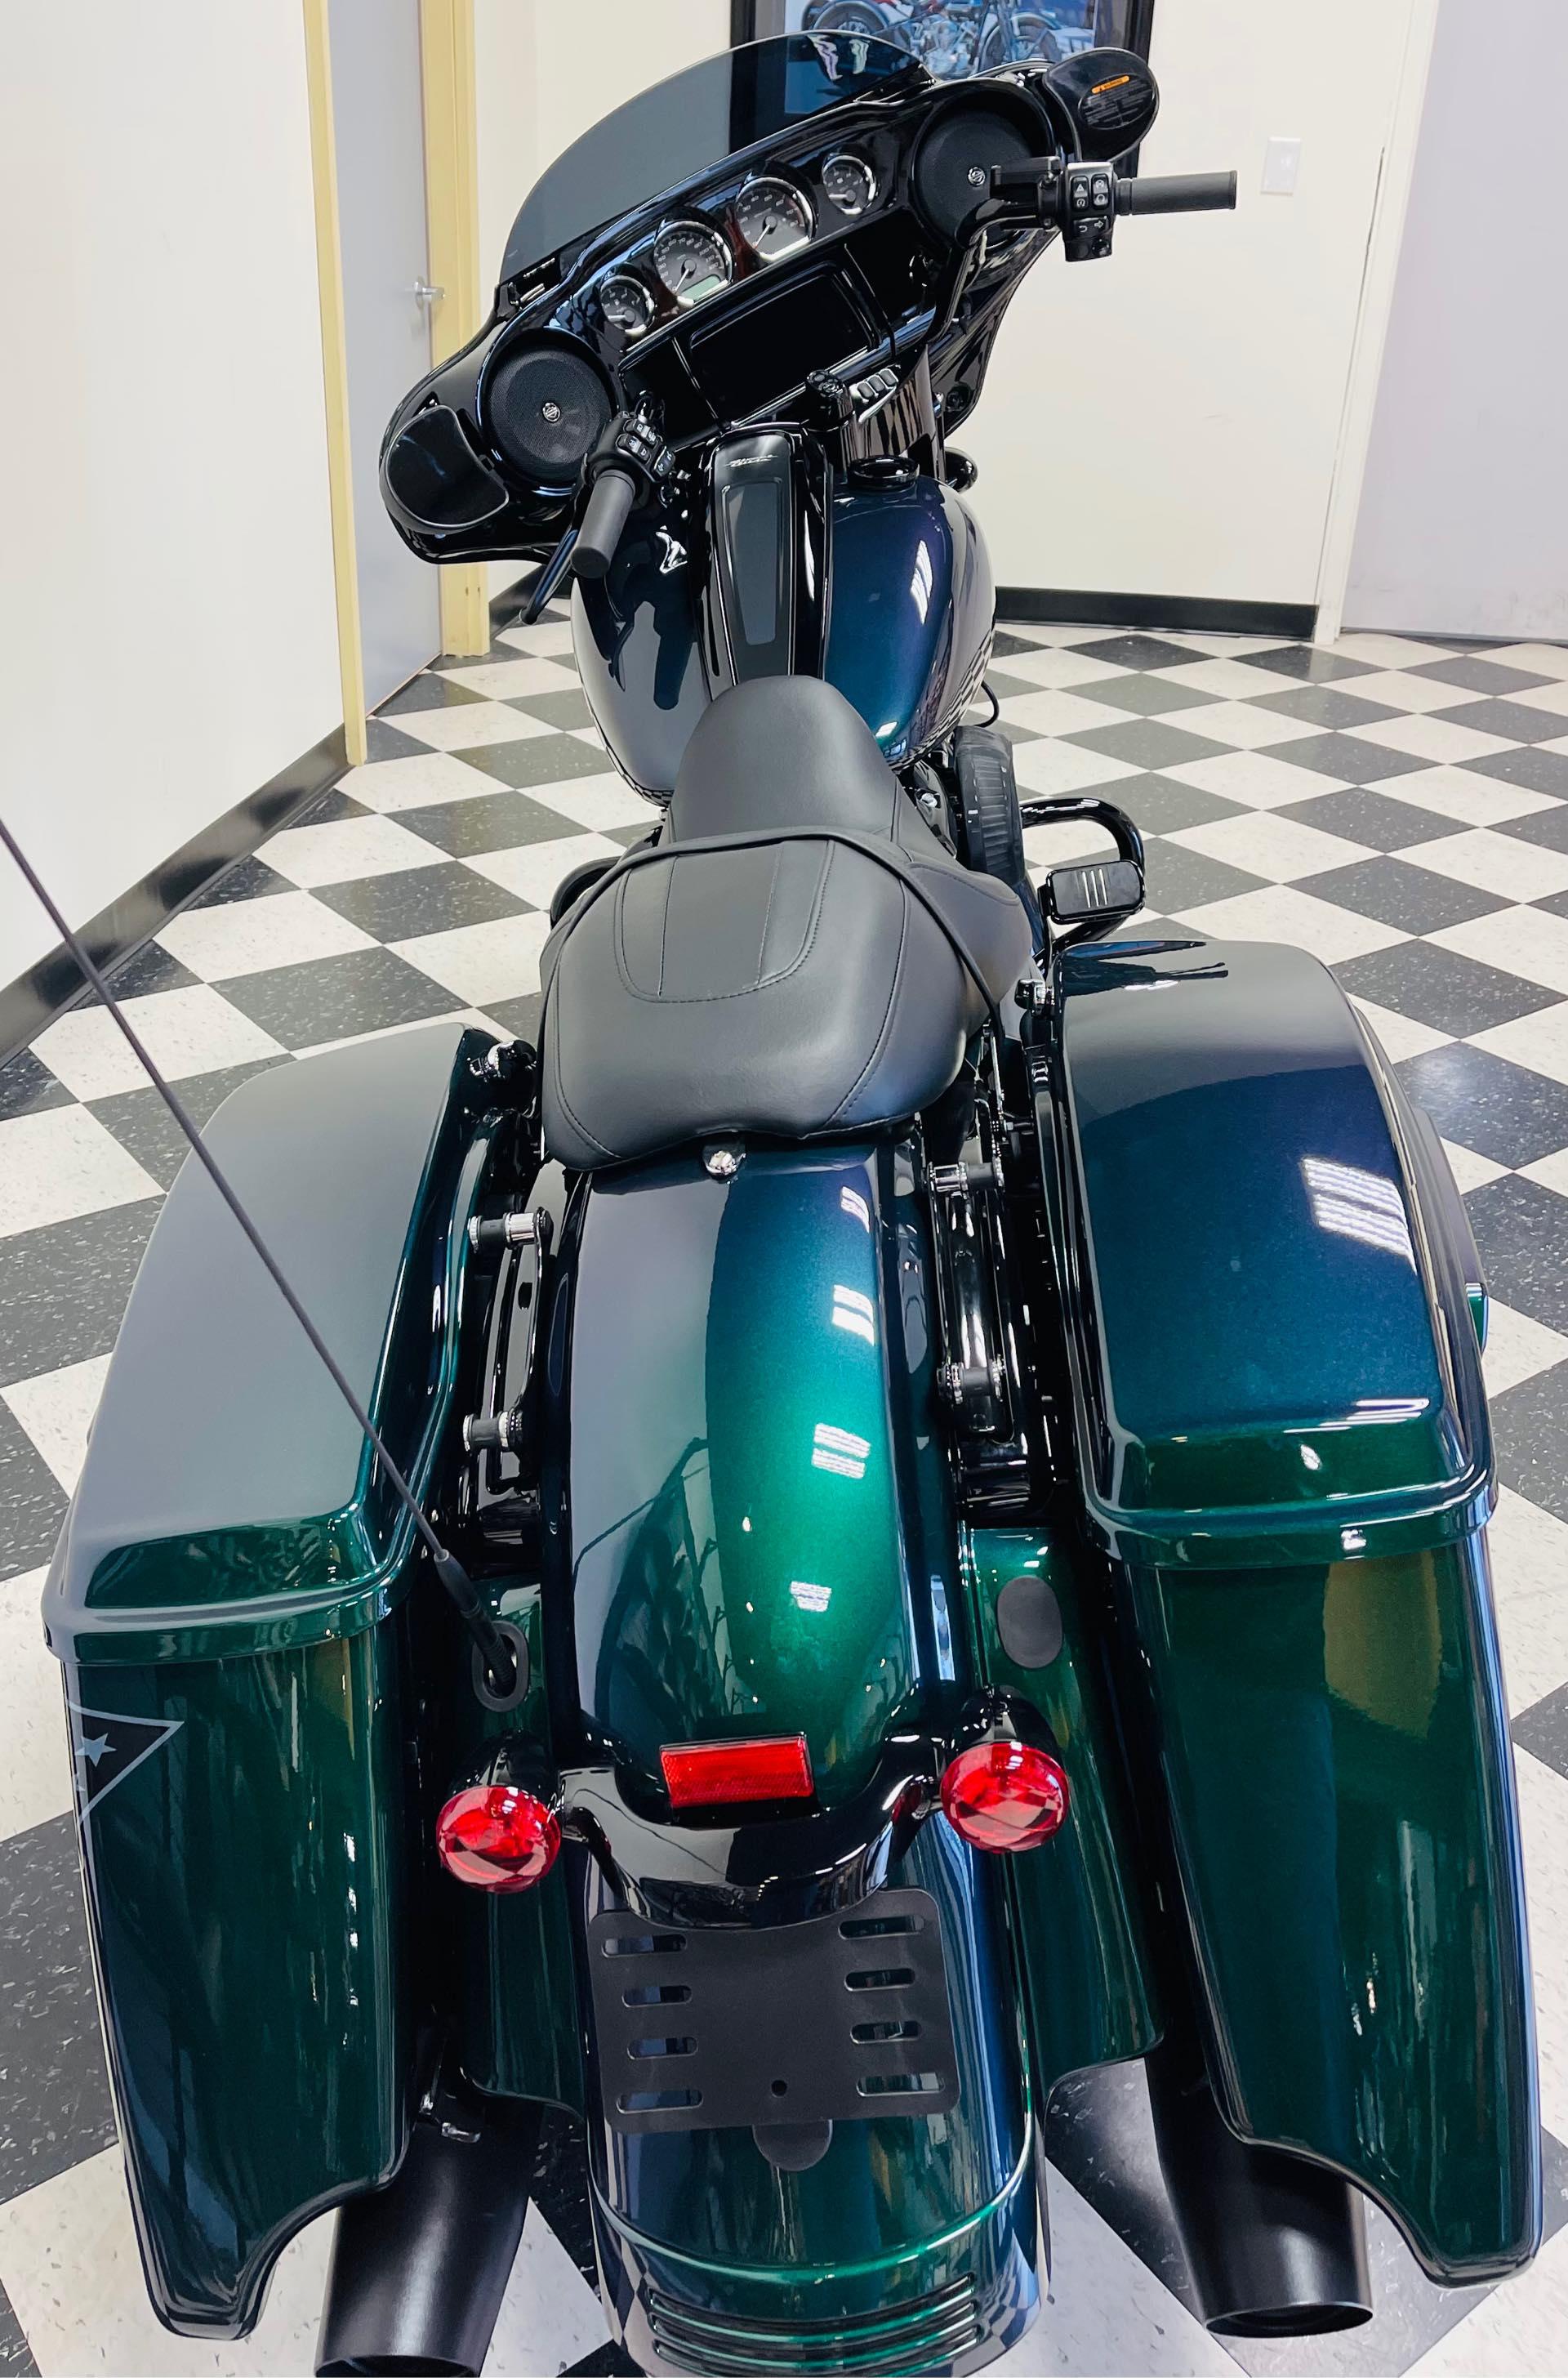 2021 Harley-Davidson FLHXS at Deluxe Harley Davidson